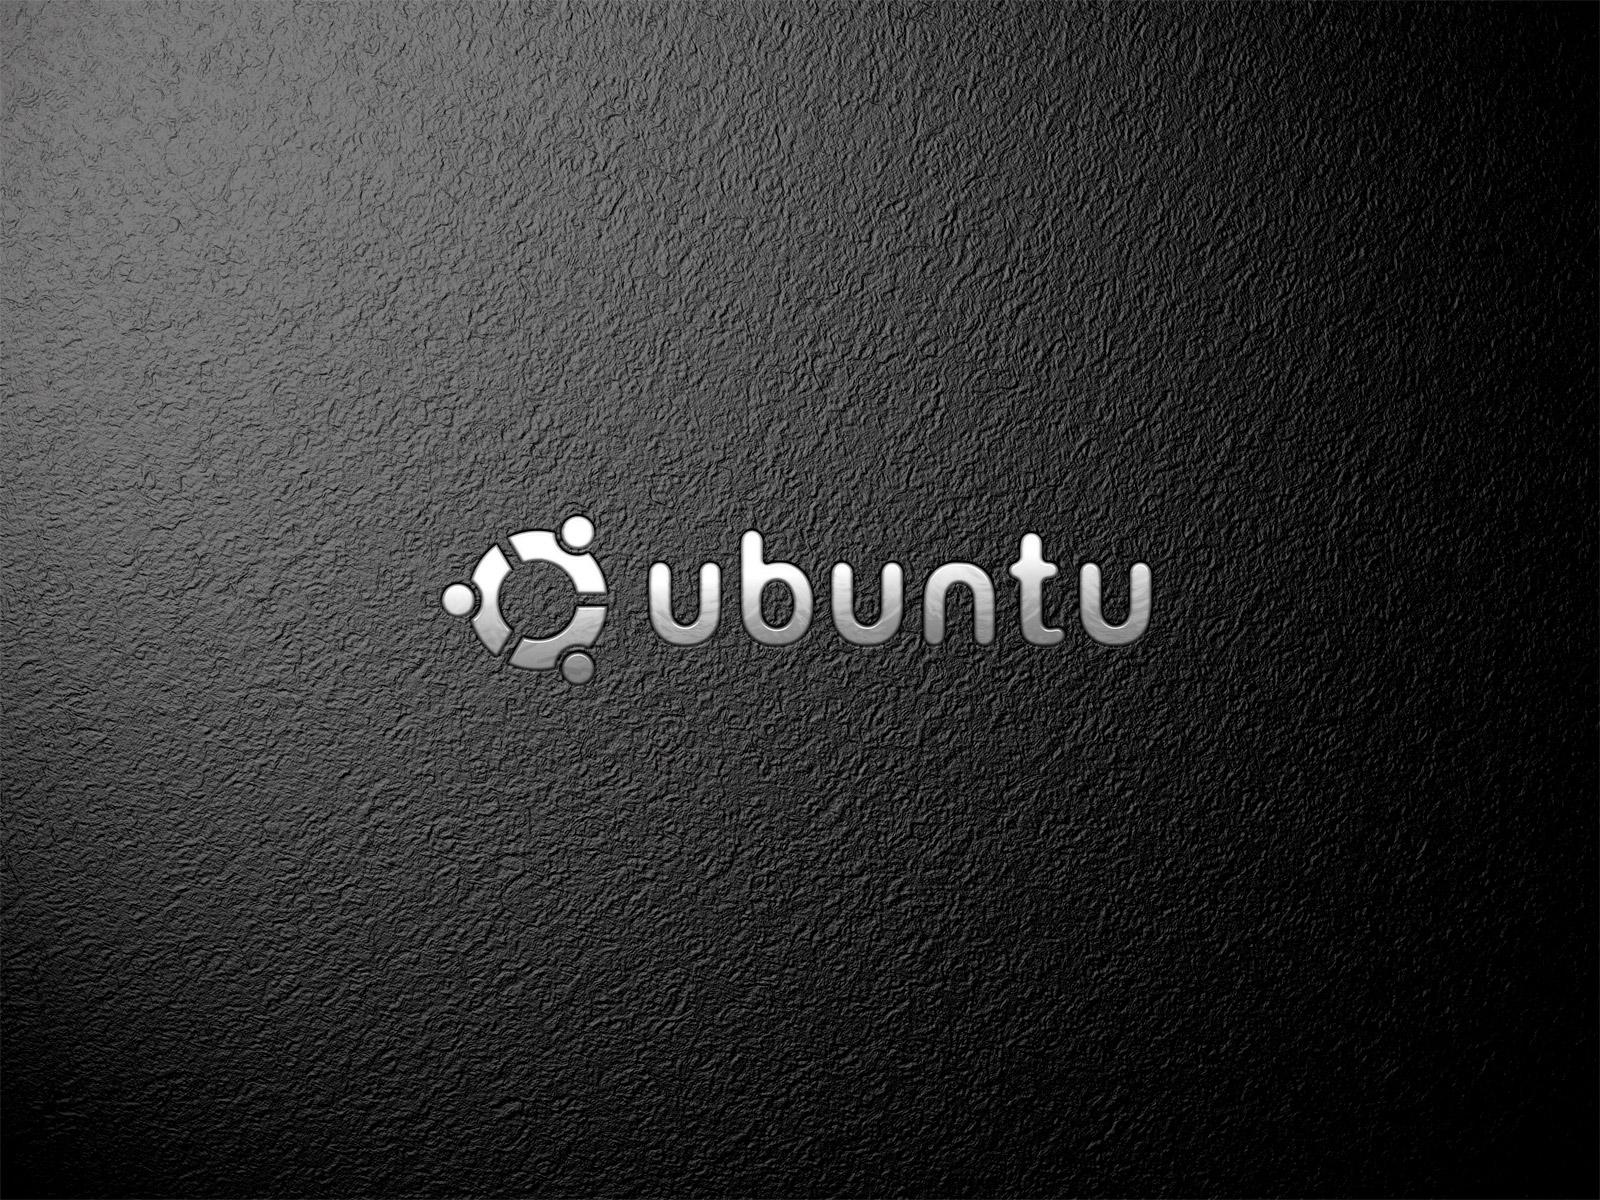 Ubuntu 3D Wallpapers HD | Wallpaper Styles